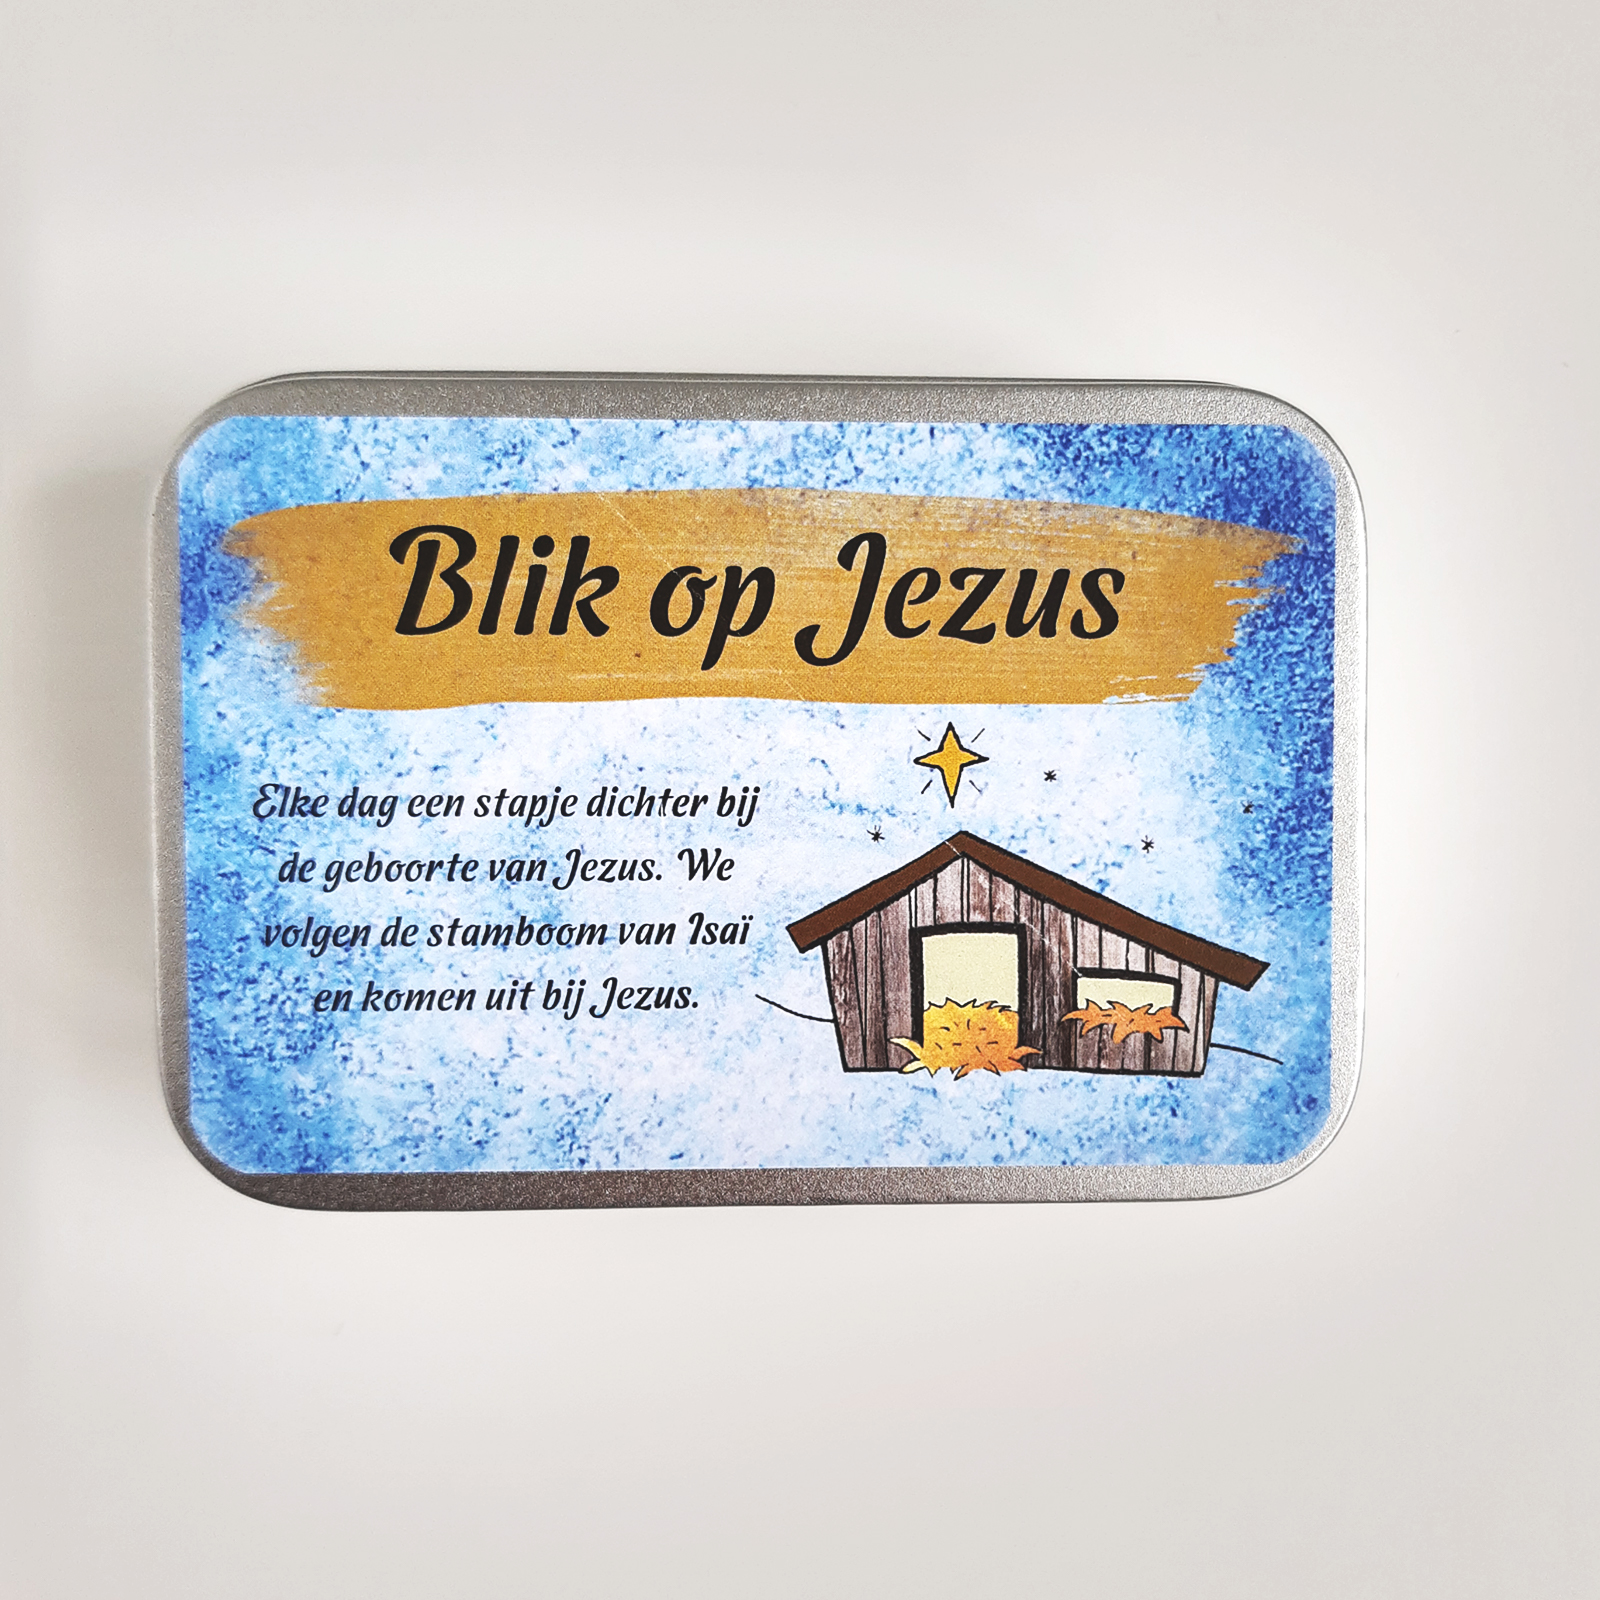 Blik op Jezus